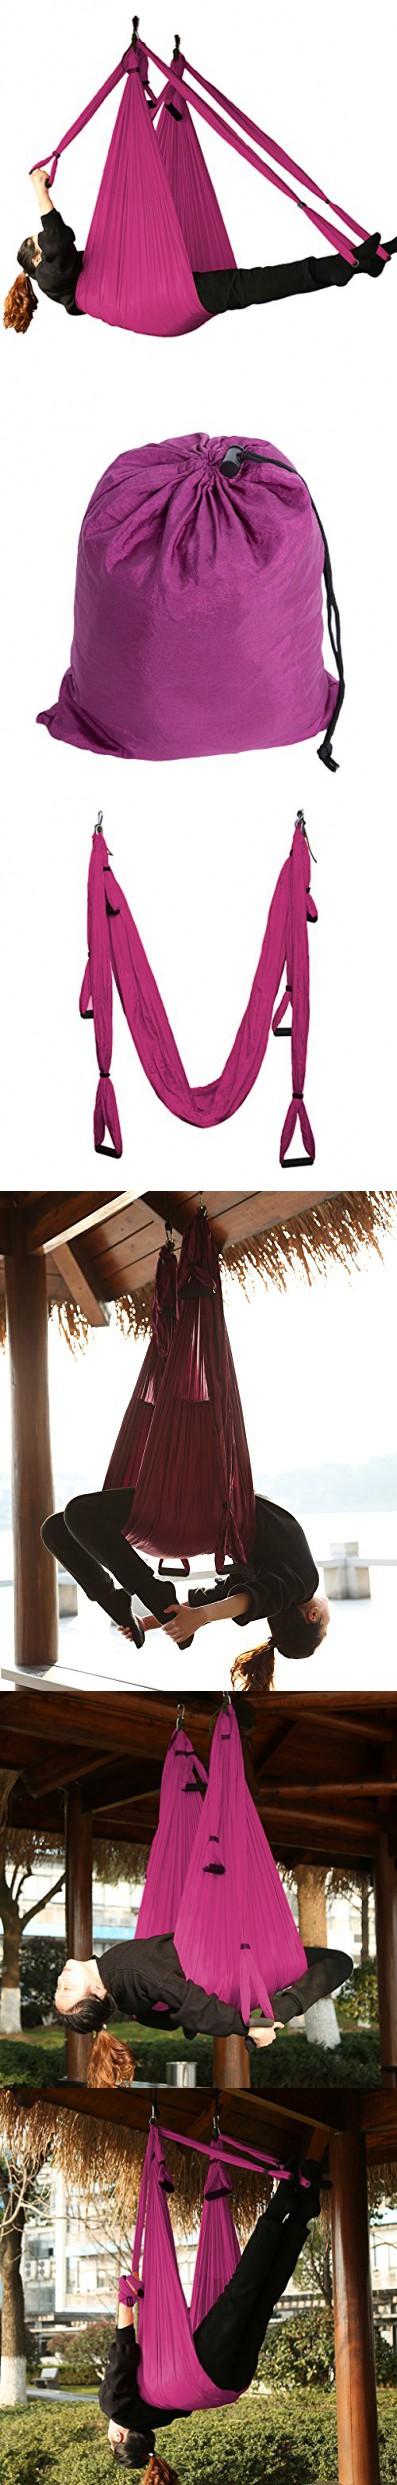 Aerial yoga swing antigravity yoga hammock air flying yoga sling